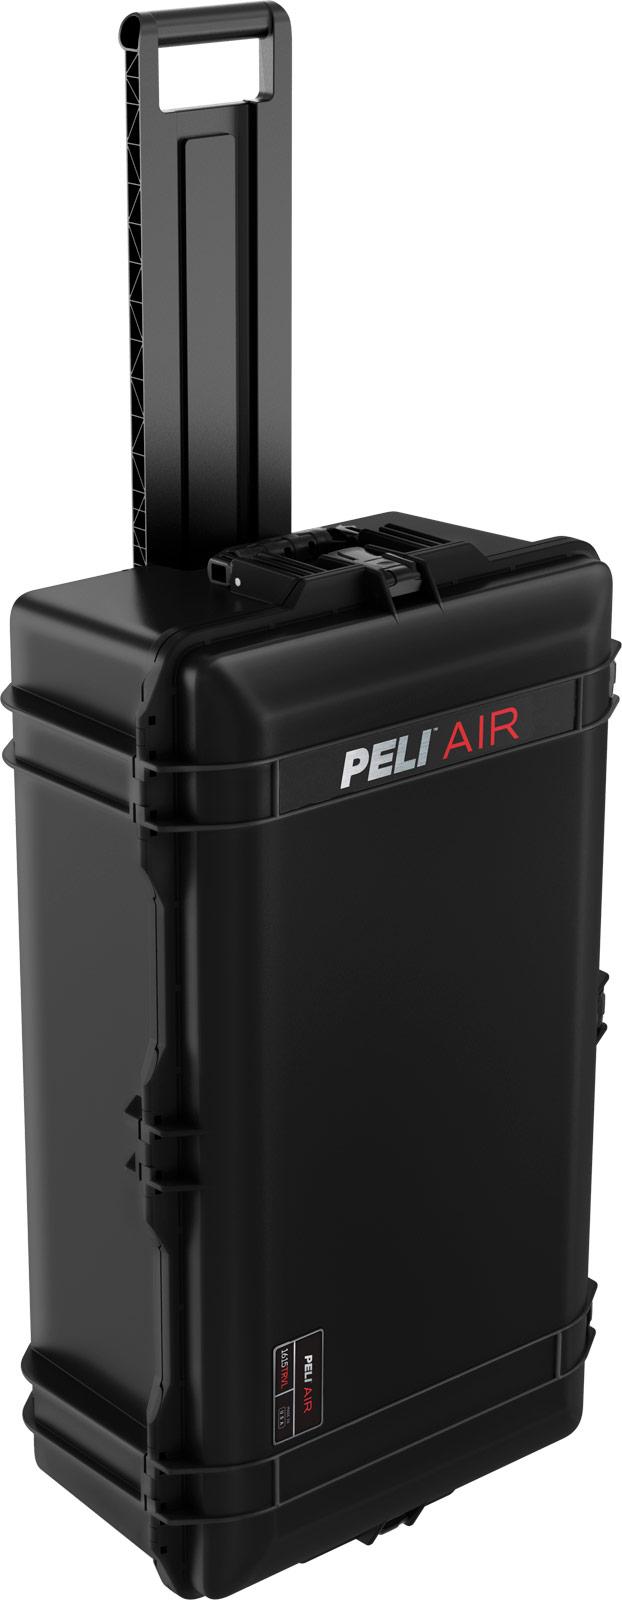 peli 1615 air wheeled luggage case